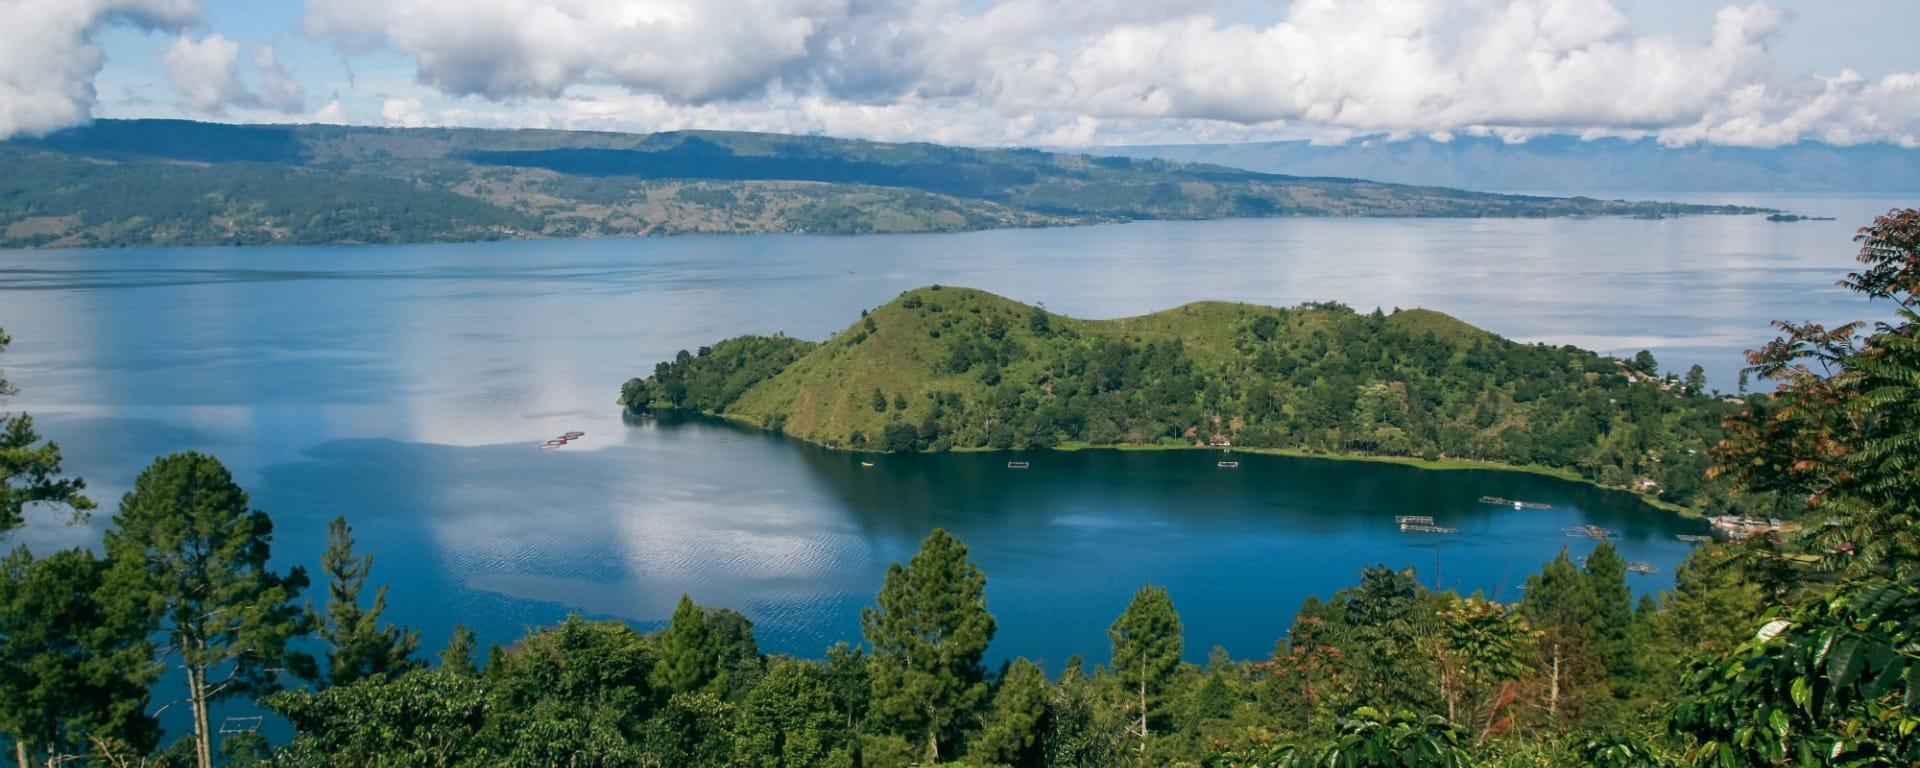 Grand circuit de Sumatra de Medan: Sumatra Lake Toba